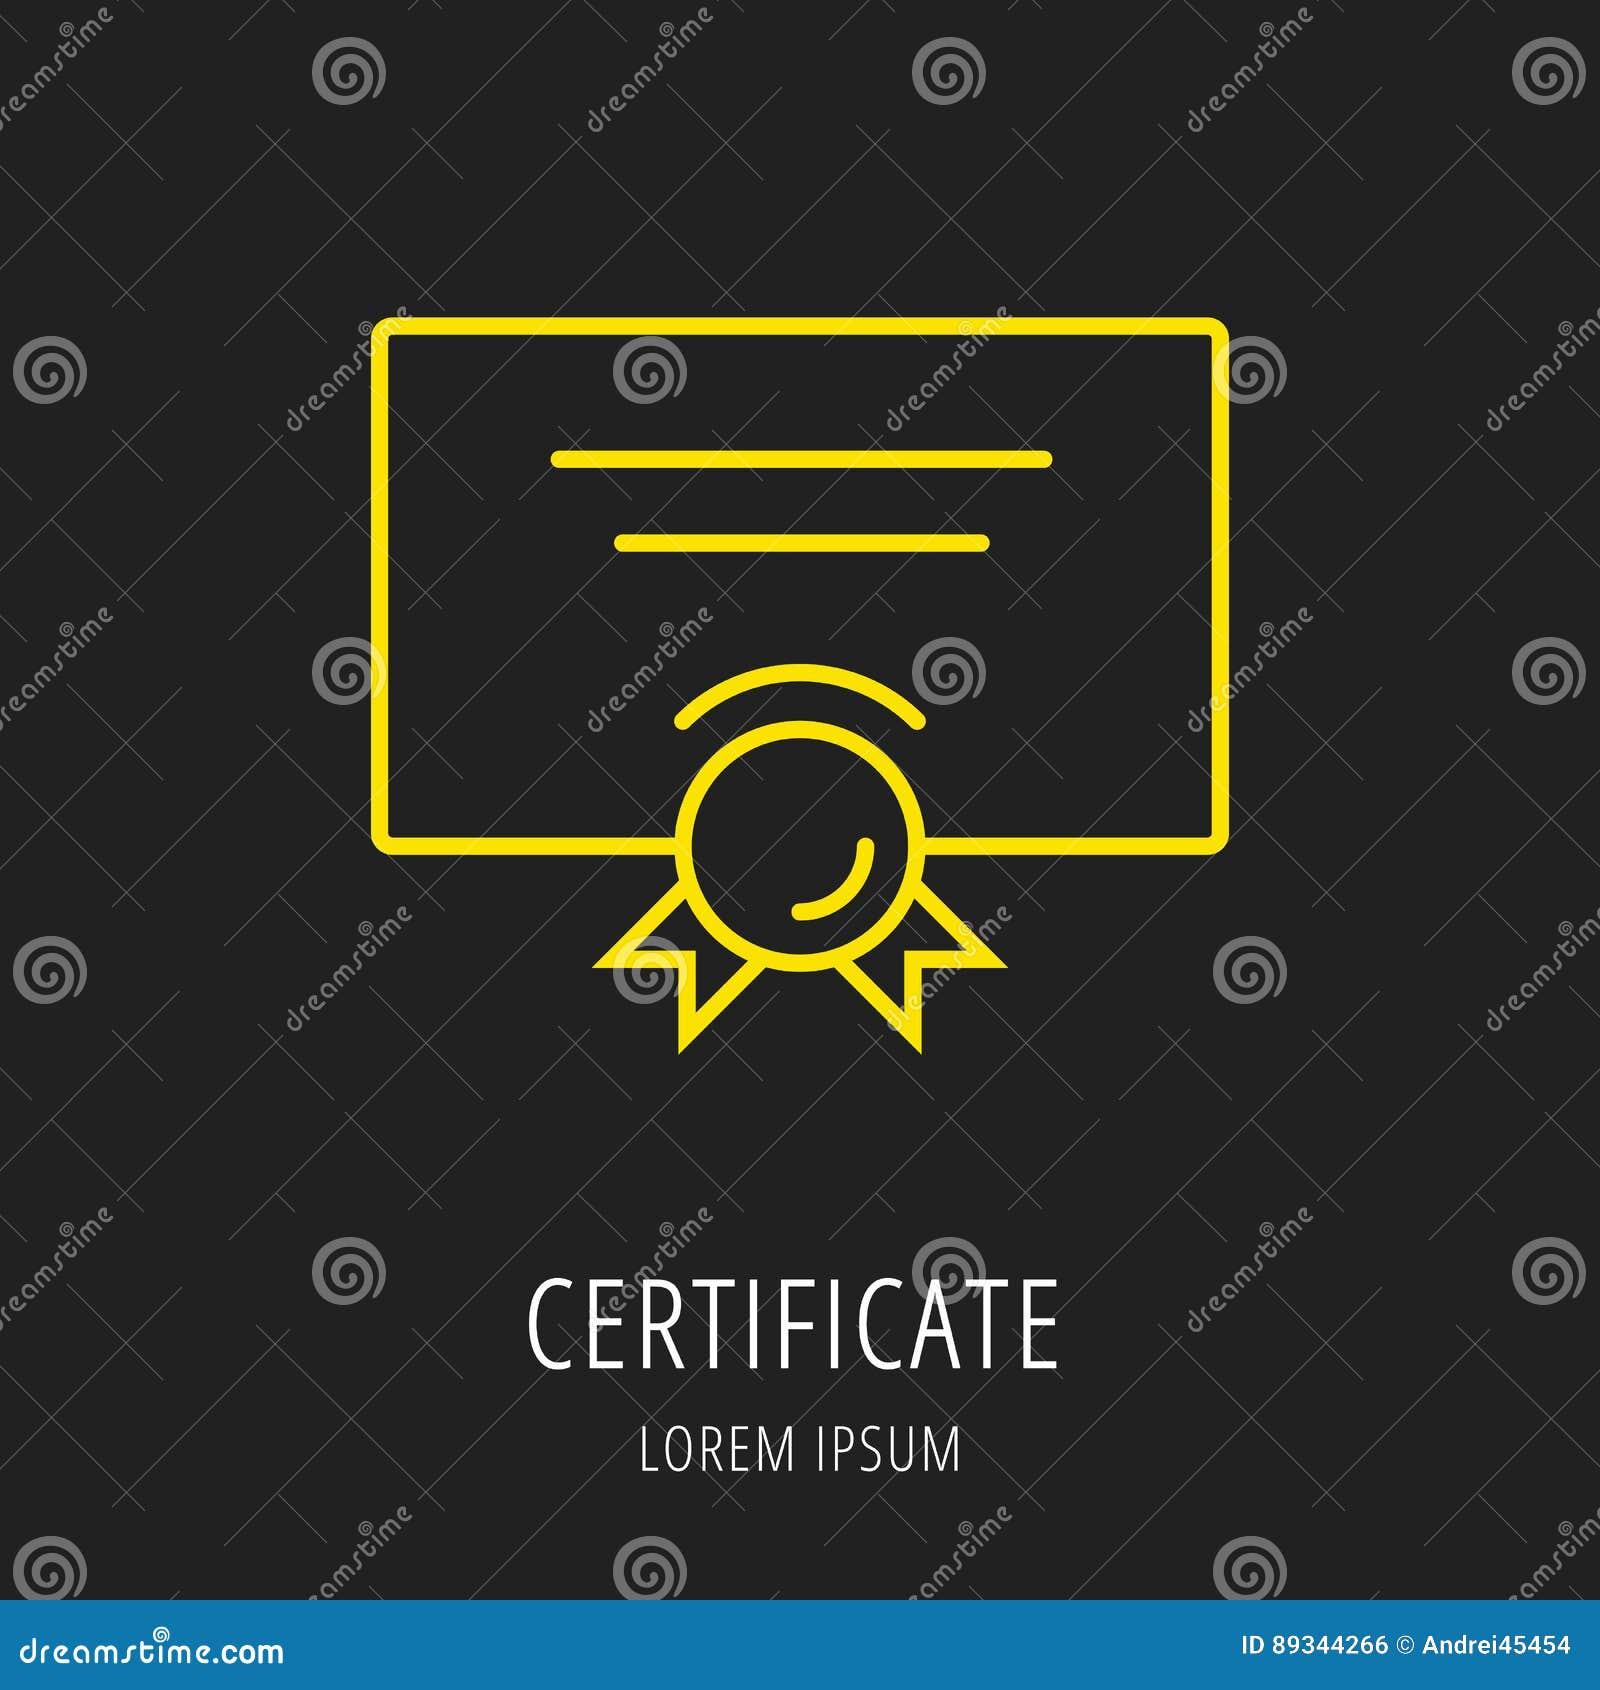 Vector Simple Logo Template Certificate